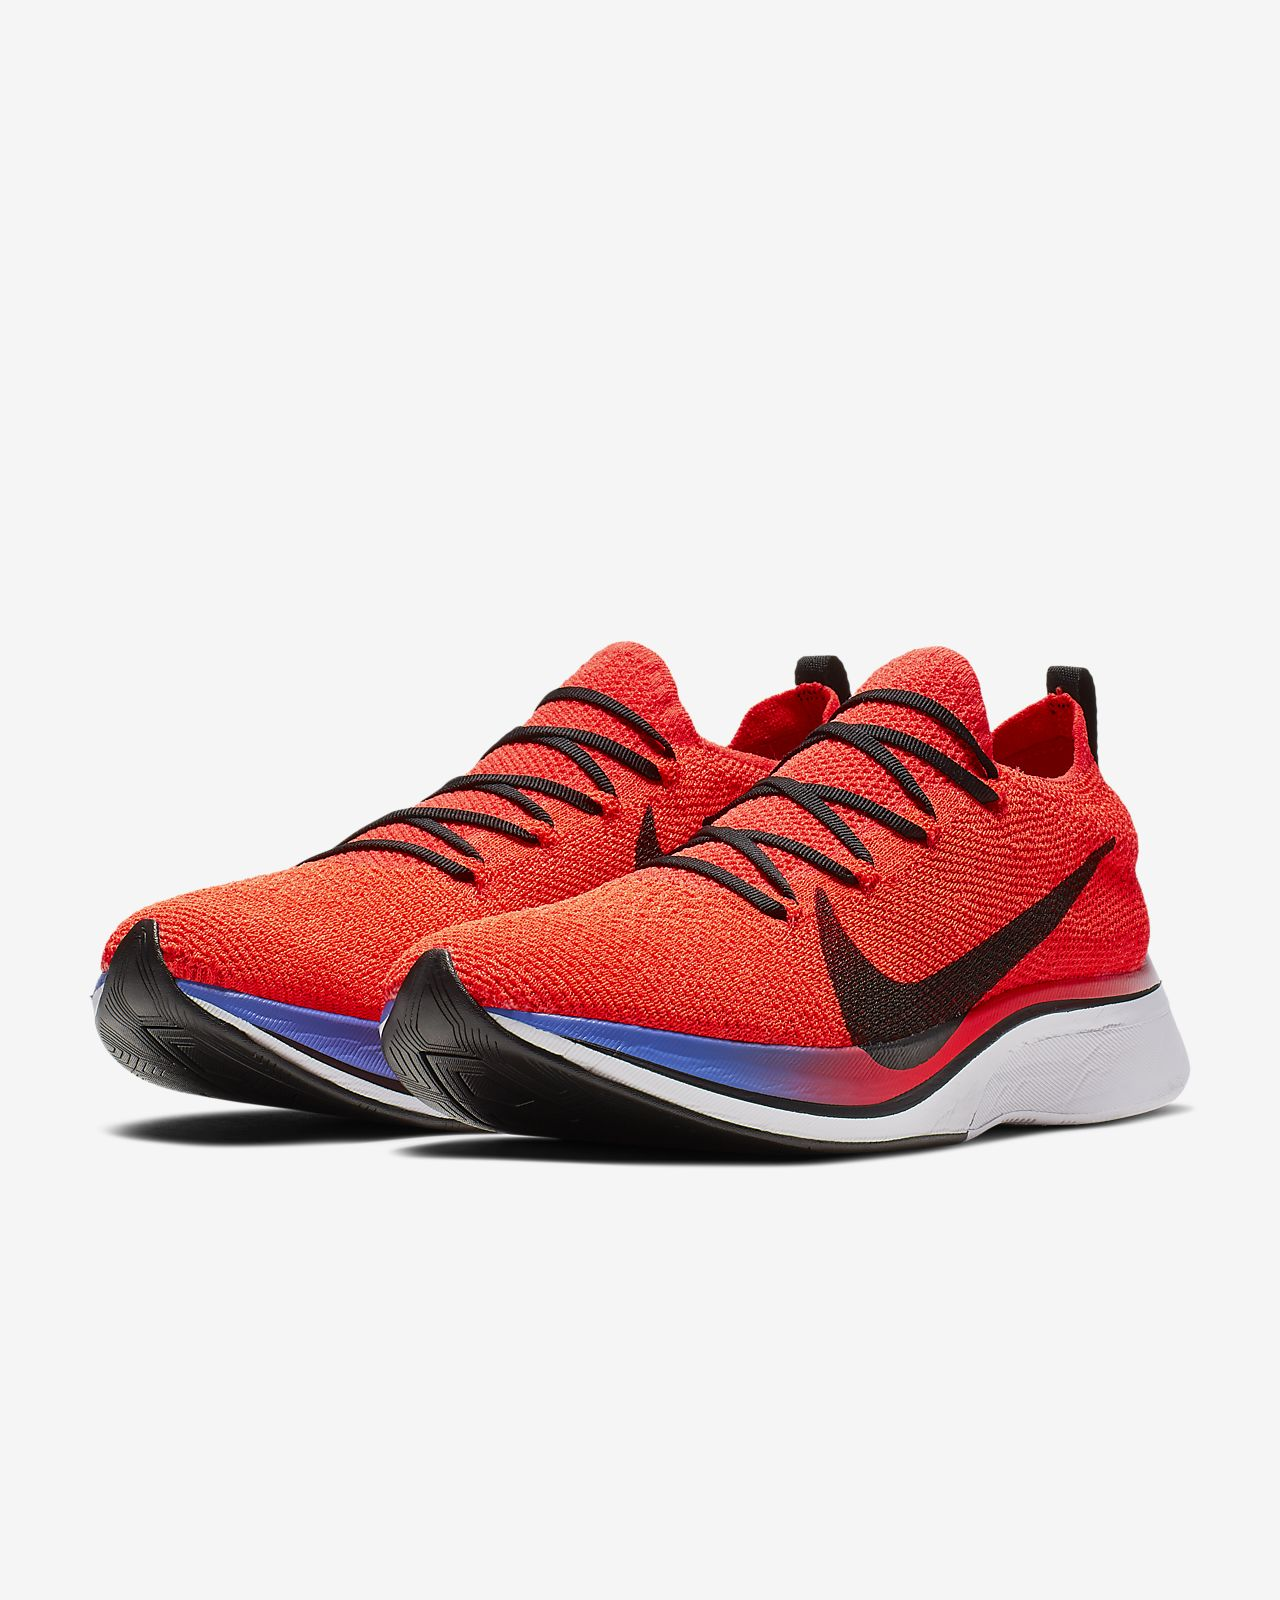 74aab0cf7332 Chaussure de running Nike Vaporfly 4% Flyknit. Nike.com MA